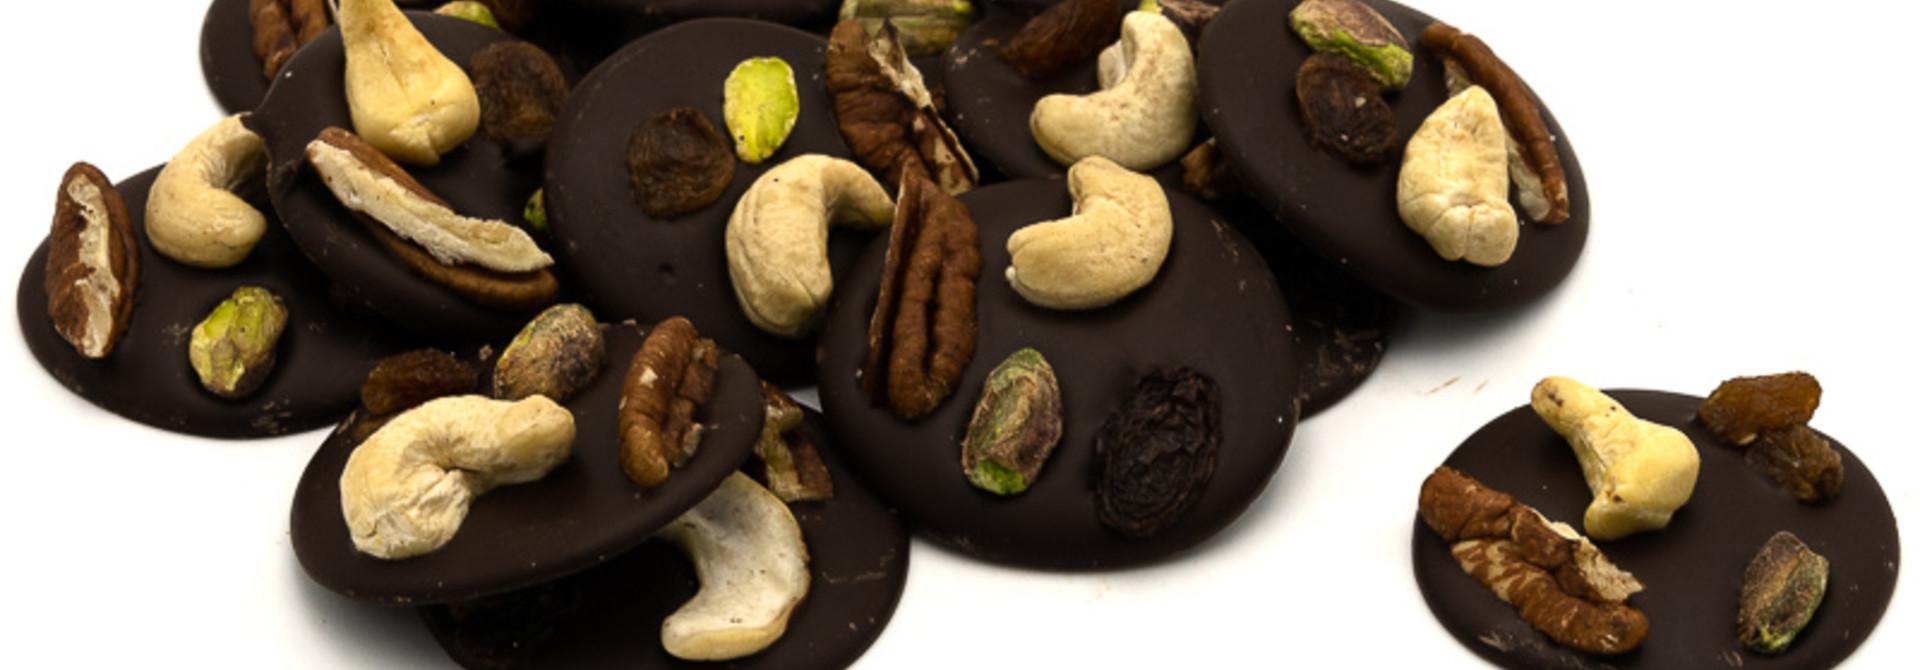 Dark with cashews, pistachio, raisins and pecan nuts